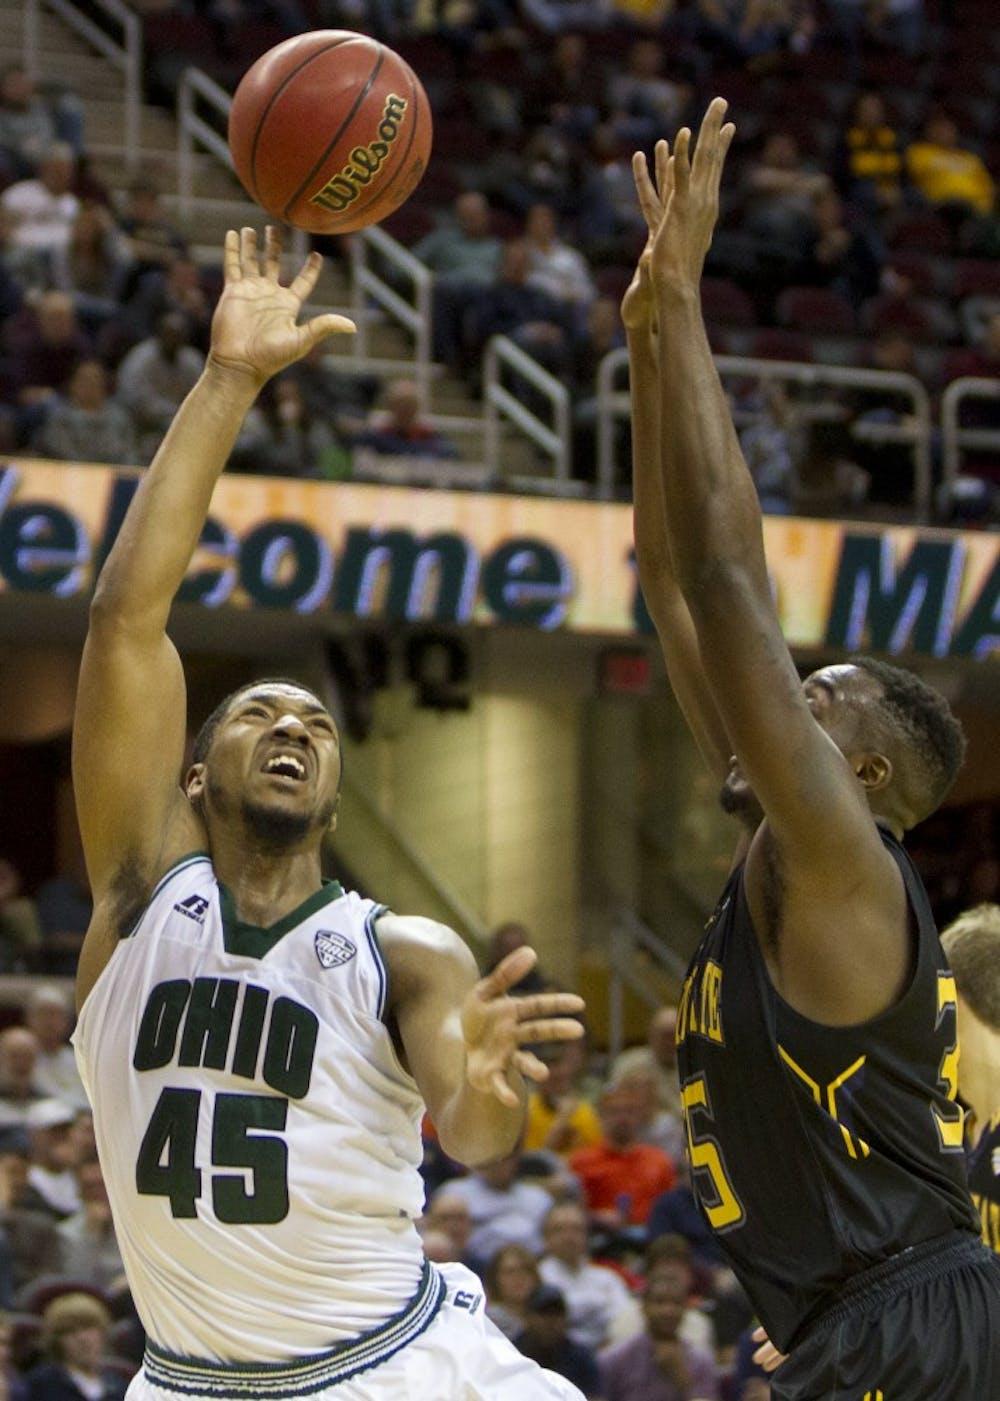 Men's Basketball: Doug Taylor brings interior presence to Bobcats